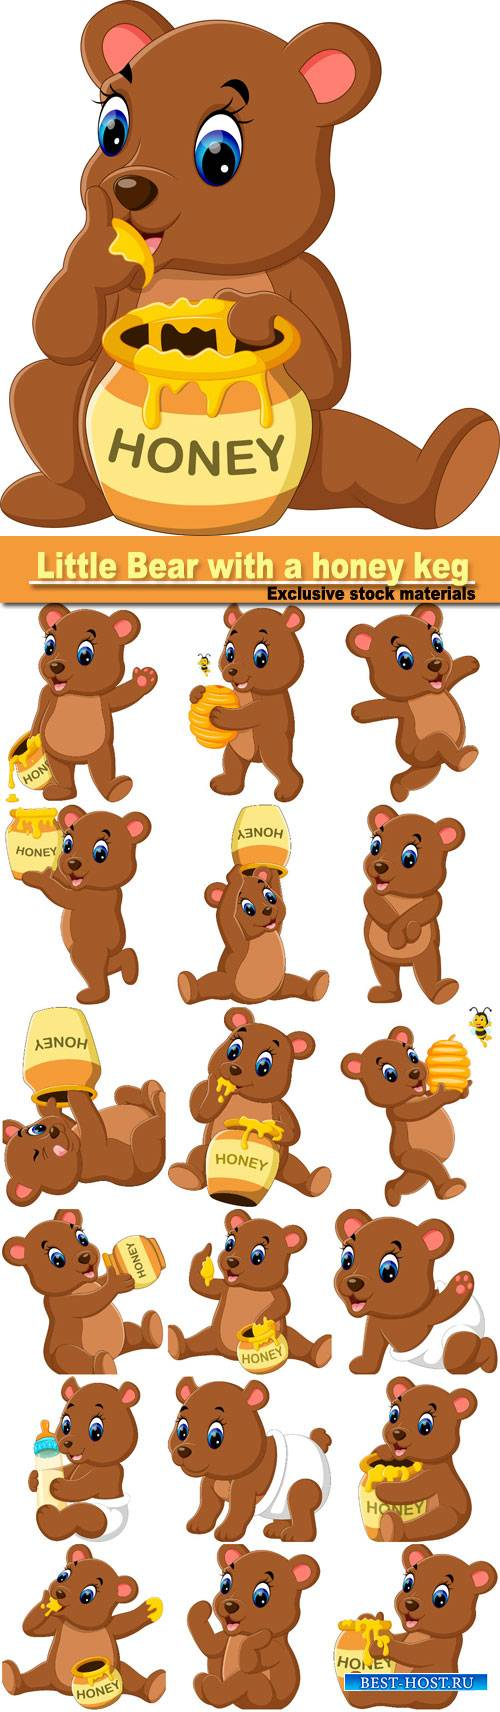 Little Bear with a honey keg